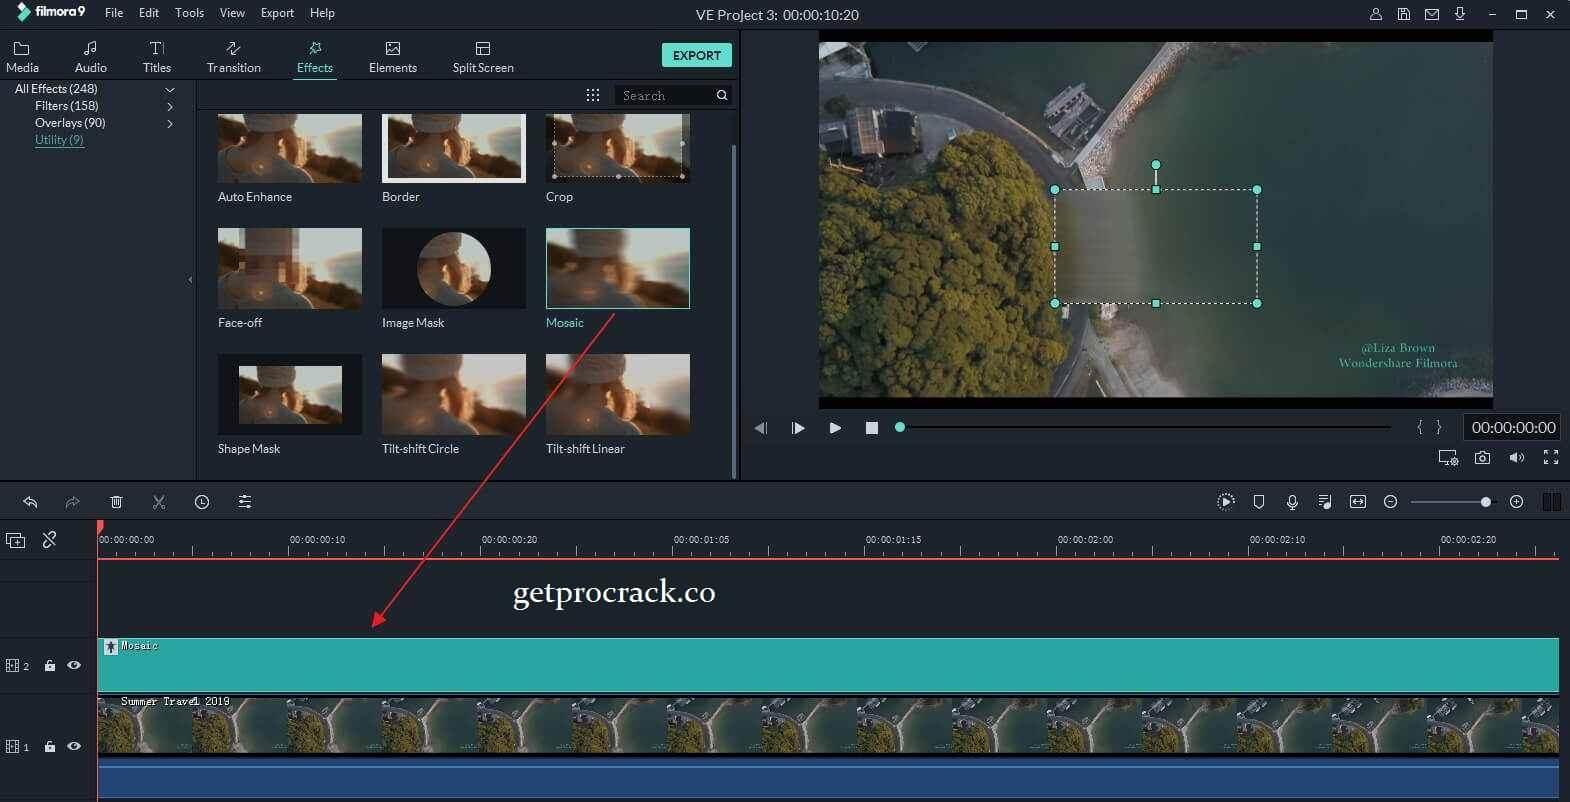 Wondershare Filmora Crack 10.1.21.6 License Code + Serial Key Torrent Download [Latest]